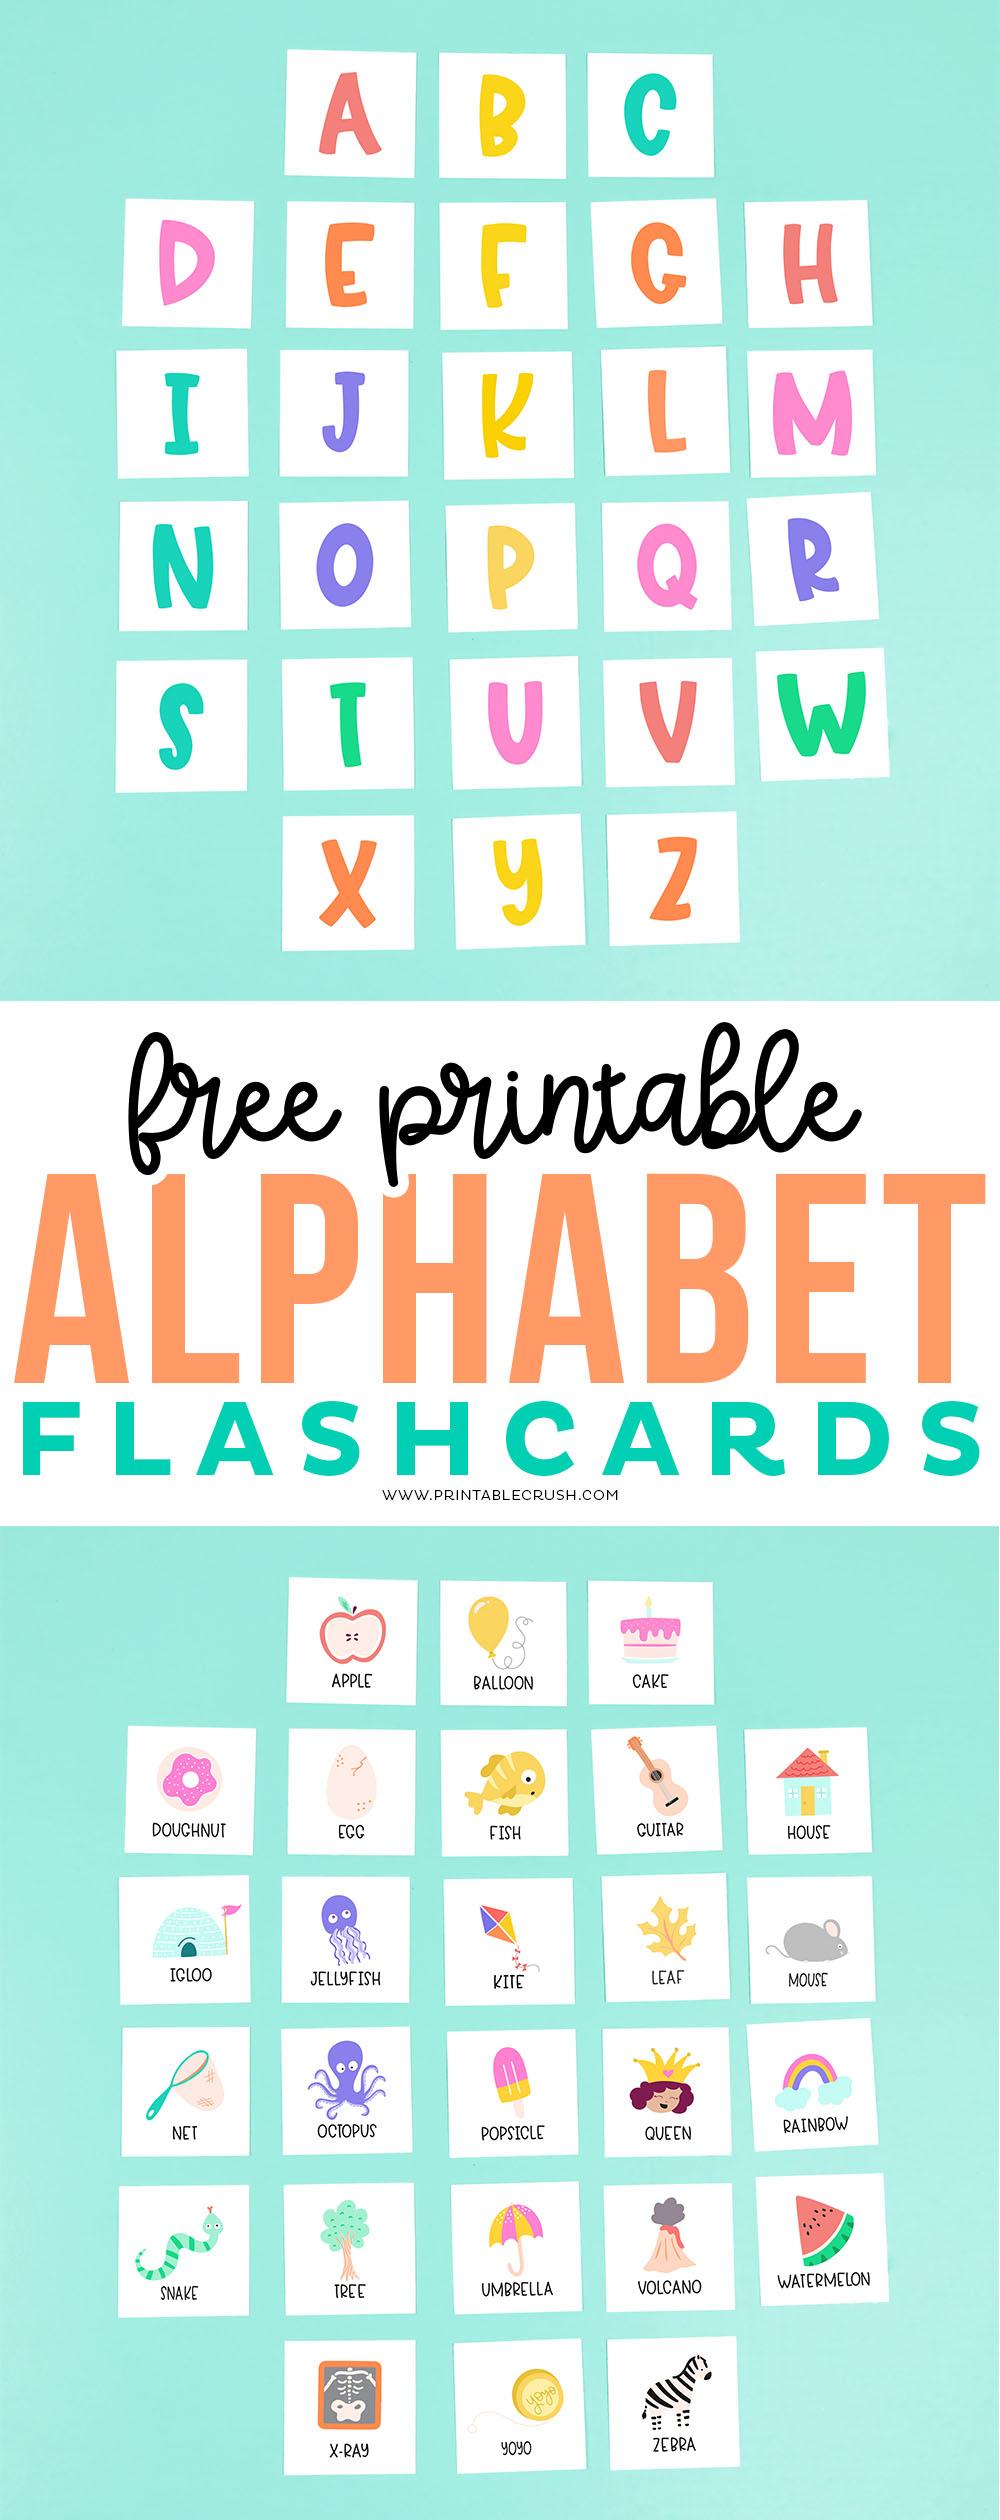 Free Printable Alphabet Flashcards - Printable Crush #homeschooling #freeprintables #freeprintable #kidactivities #alphabetprintables #alphabet #learningactivities #homeschoolprintables via @printablecrush